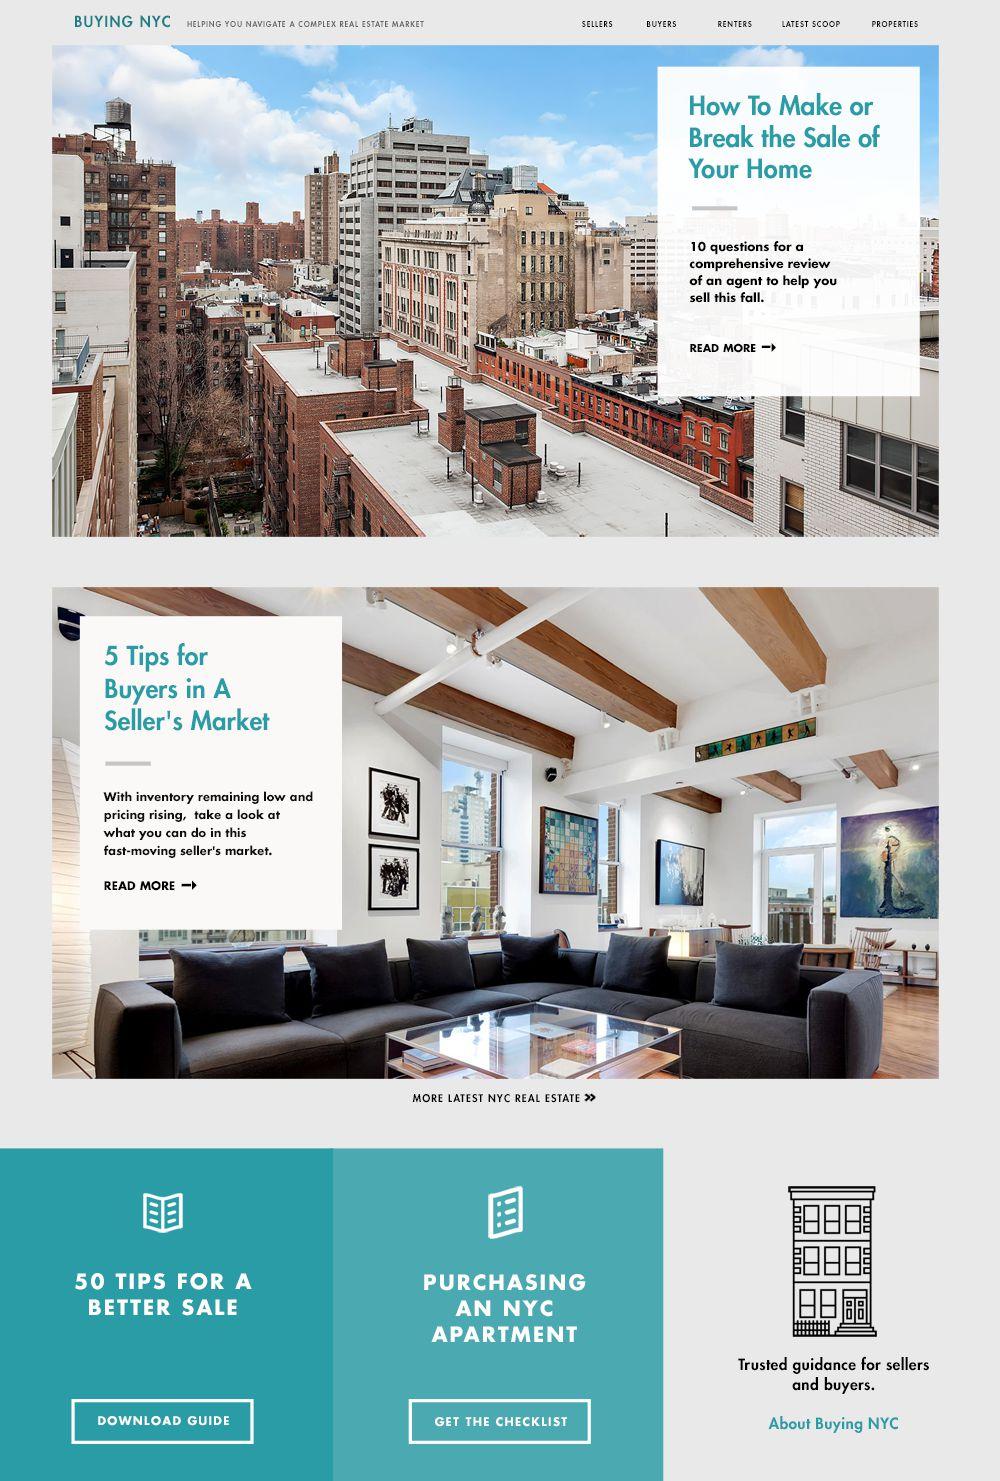 Buying NYC Homepage